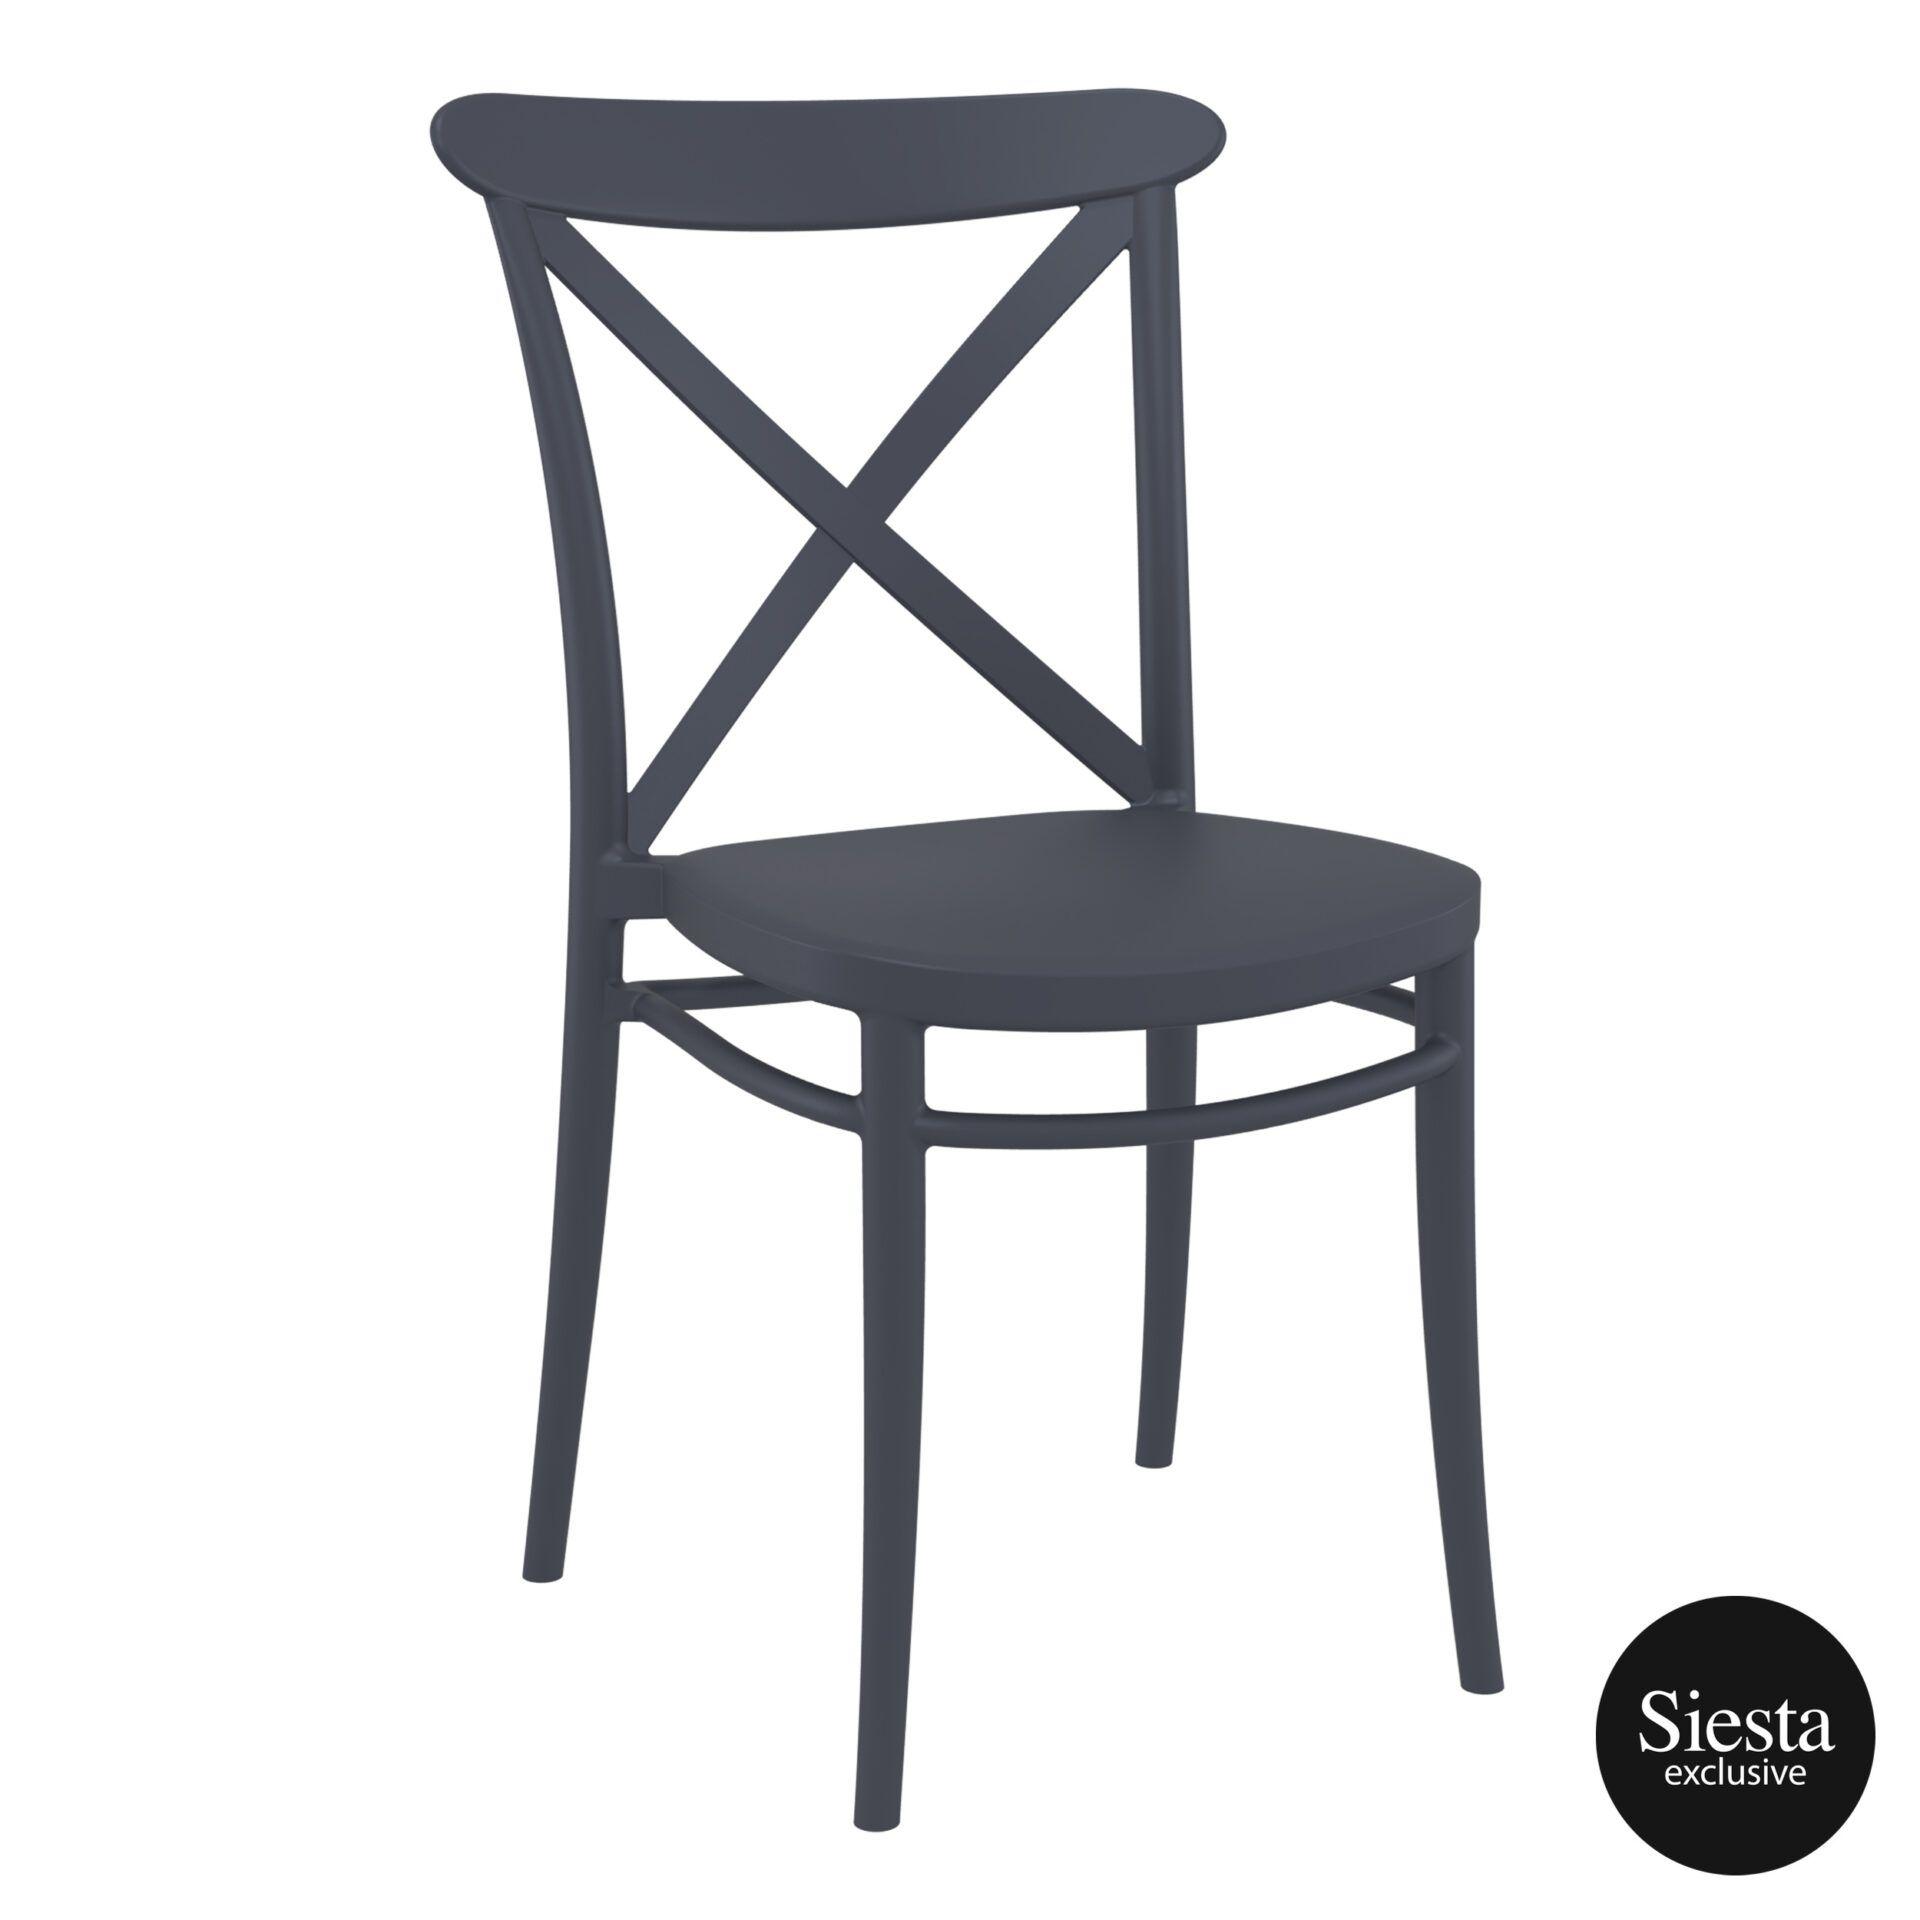 cafe polypropylene cross chair darkgrey front side 3